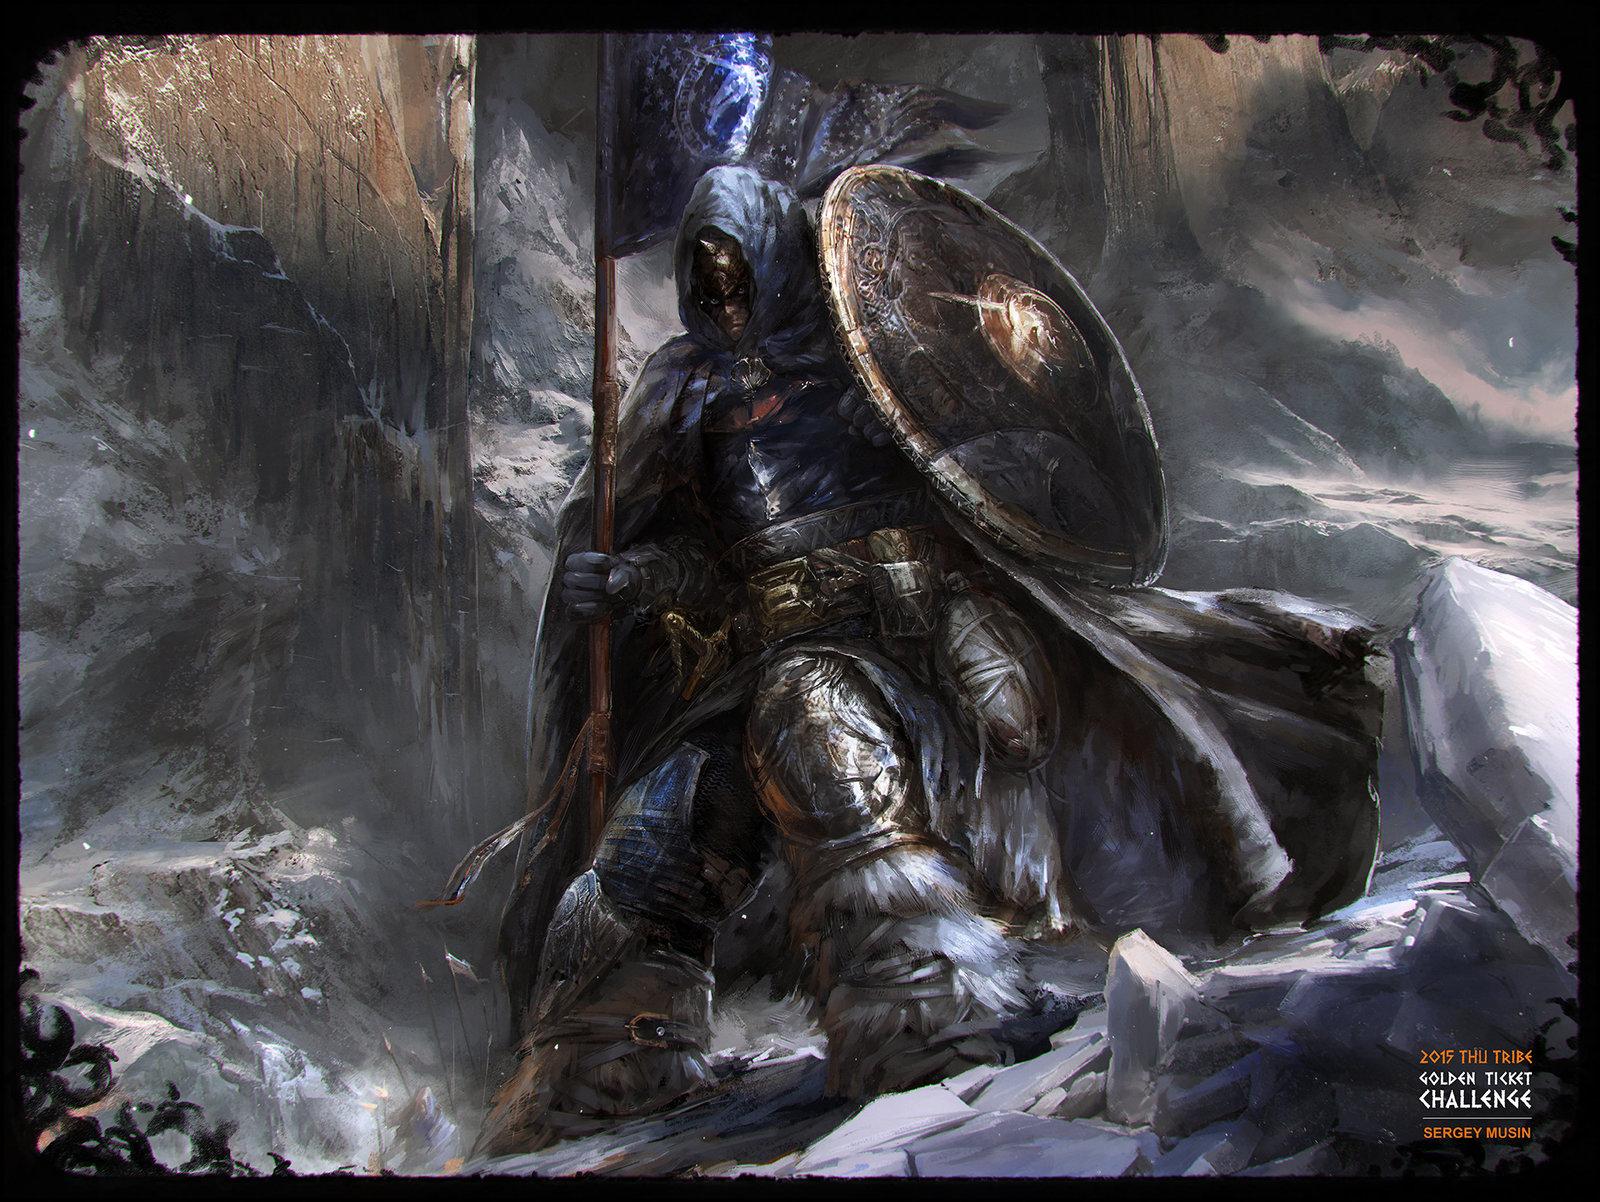 Fingolfin was a Unicorn